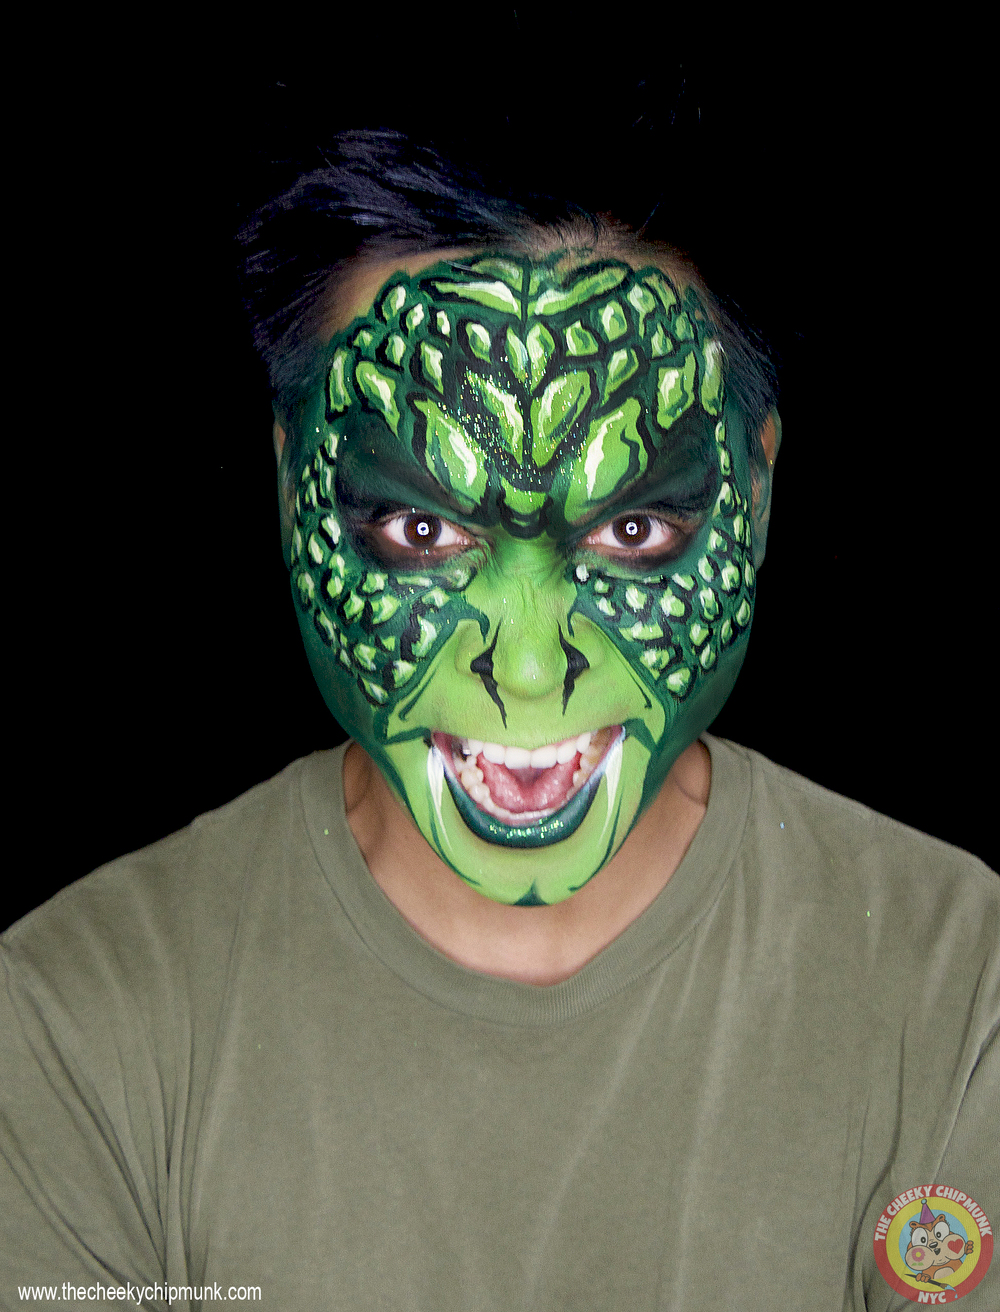 alexis reptile man 2.jpg